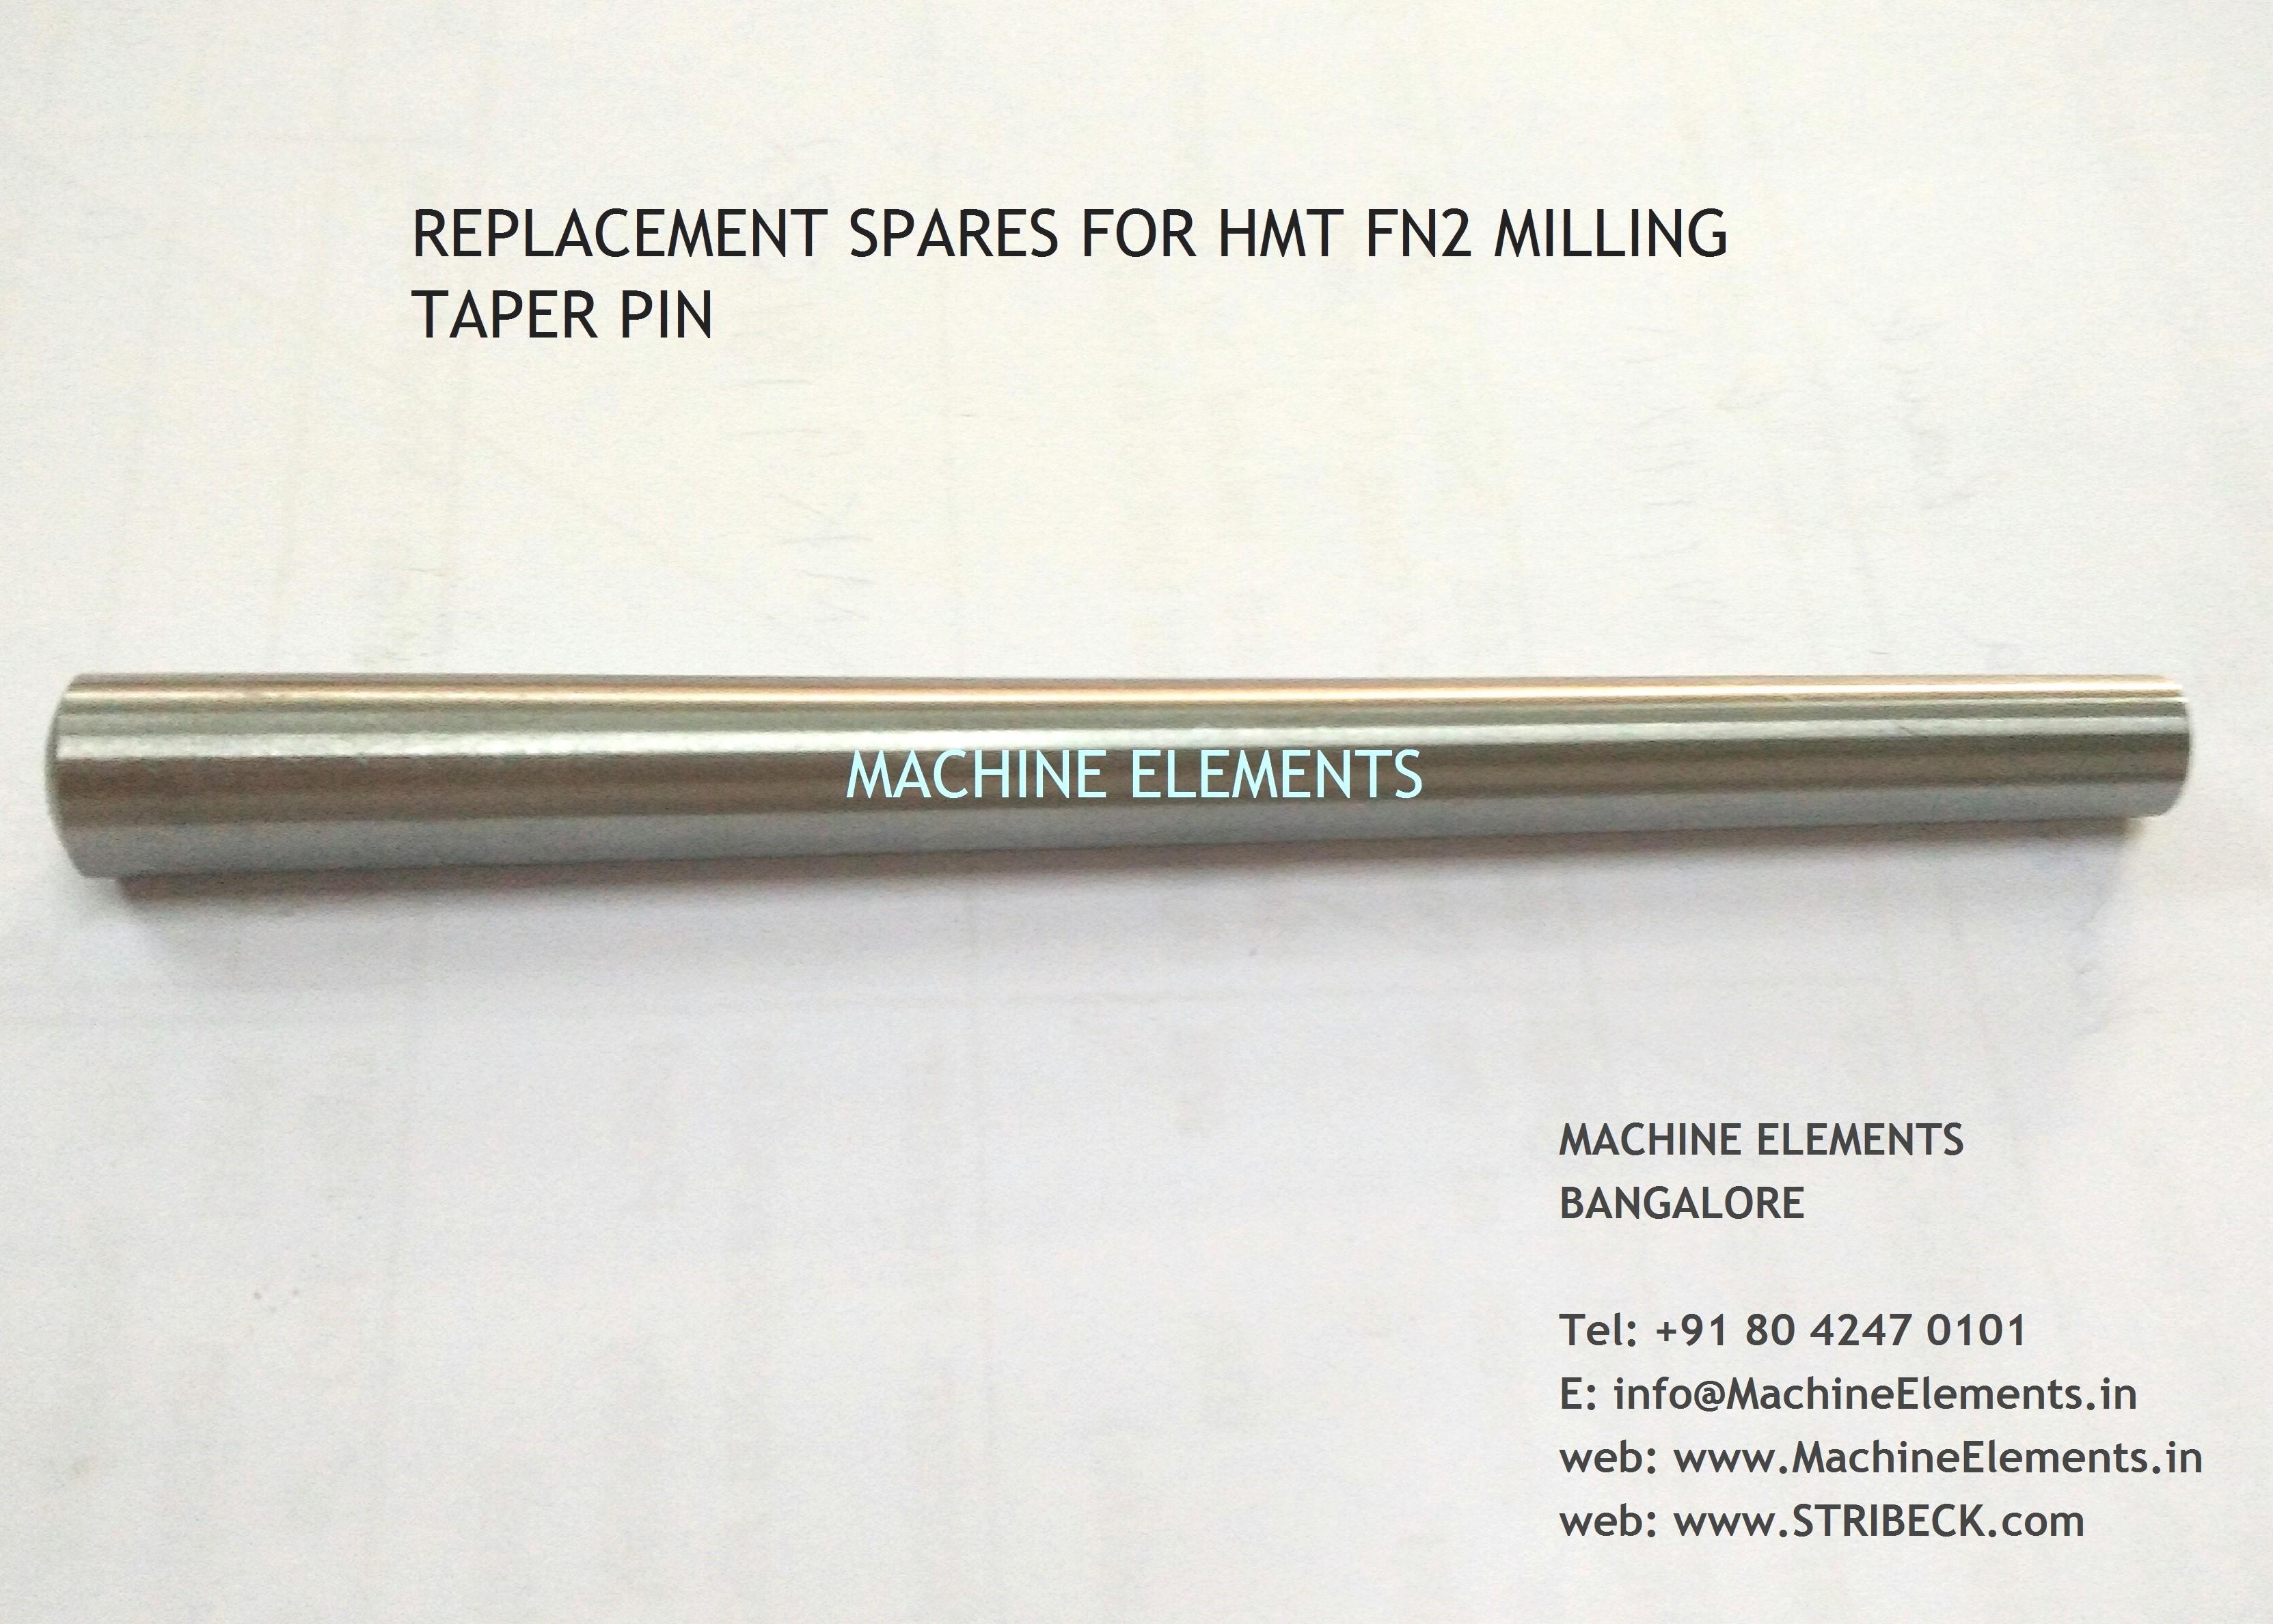 TAPER PIN